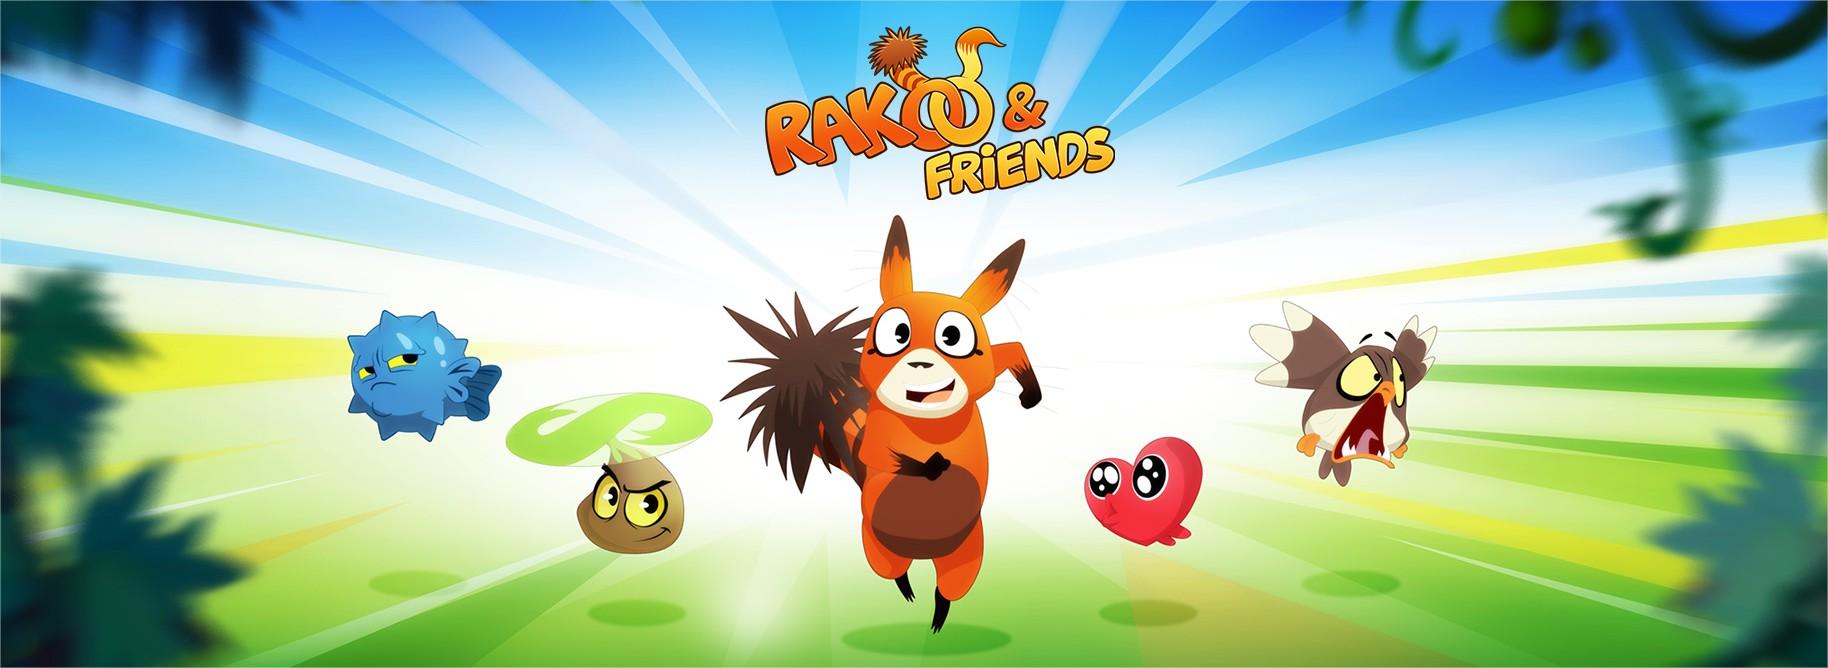 Rakoo & Friends  Old Skull Games - Mozilla Firefox.jpg